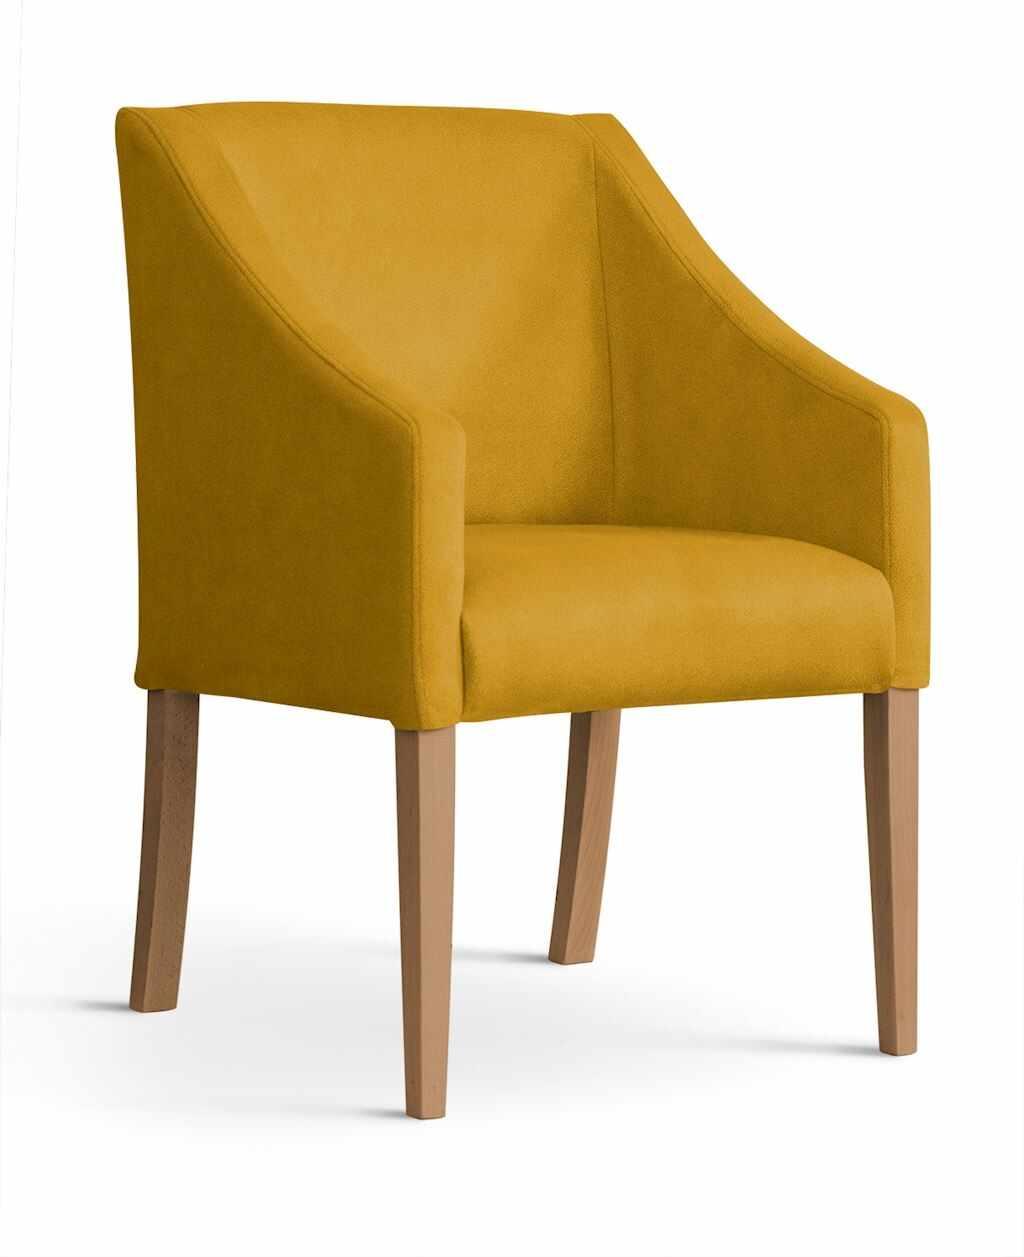 Fotoliu fix tapitat cu stofa si picioare din lemn Capri Velvet Mustariu / Stejar, l58xA60xH89 cm la pret 779 lei